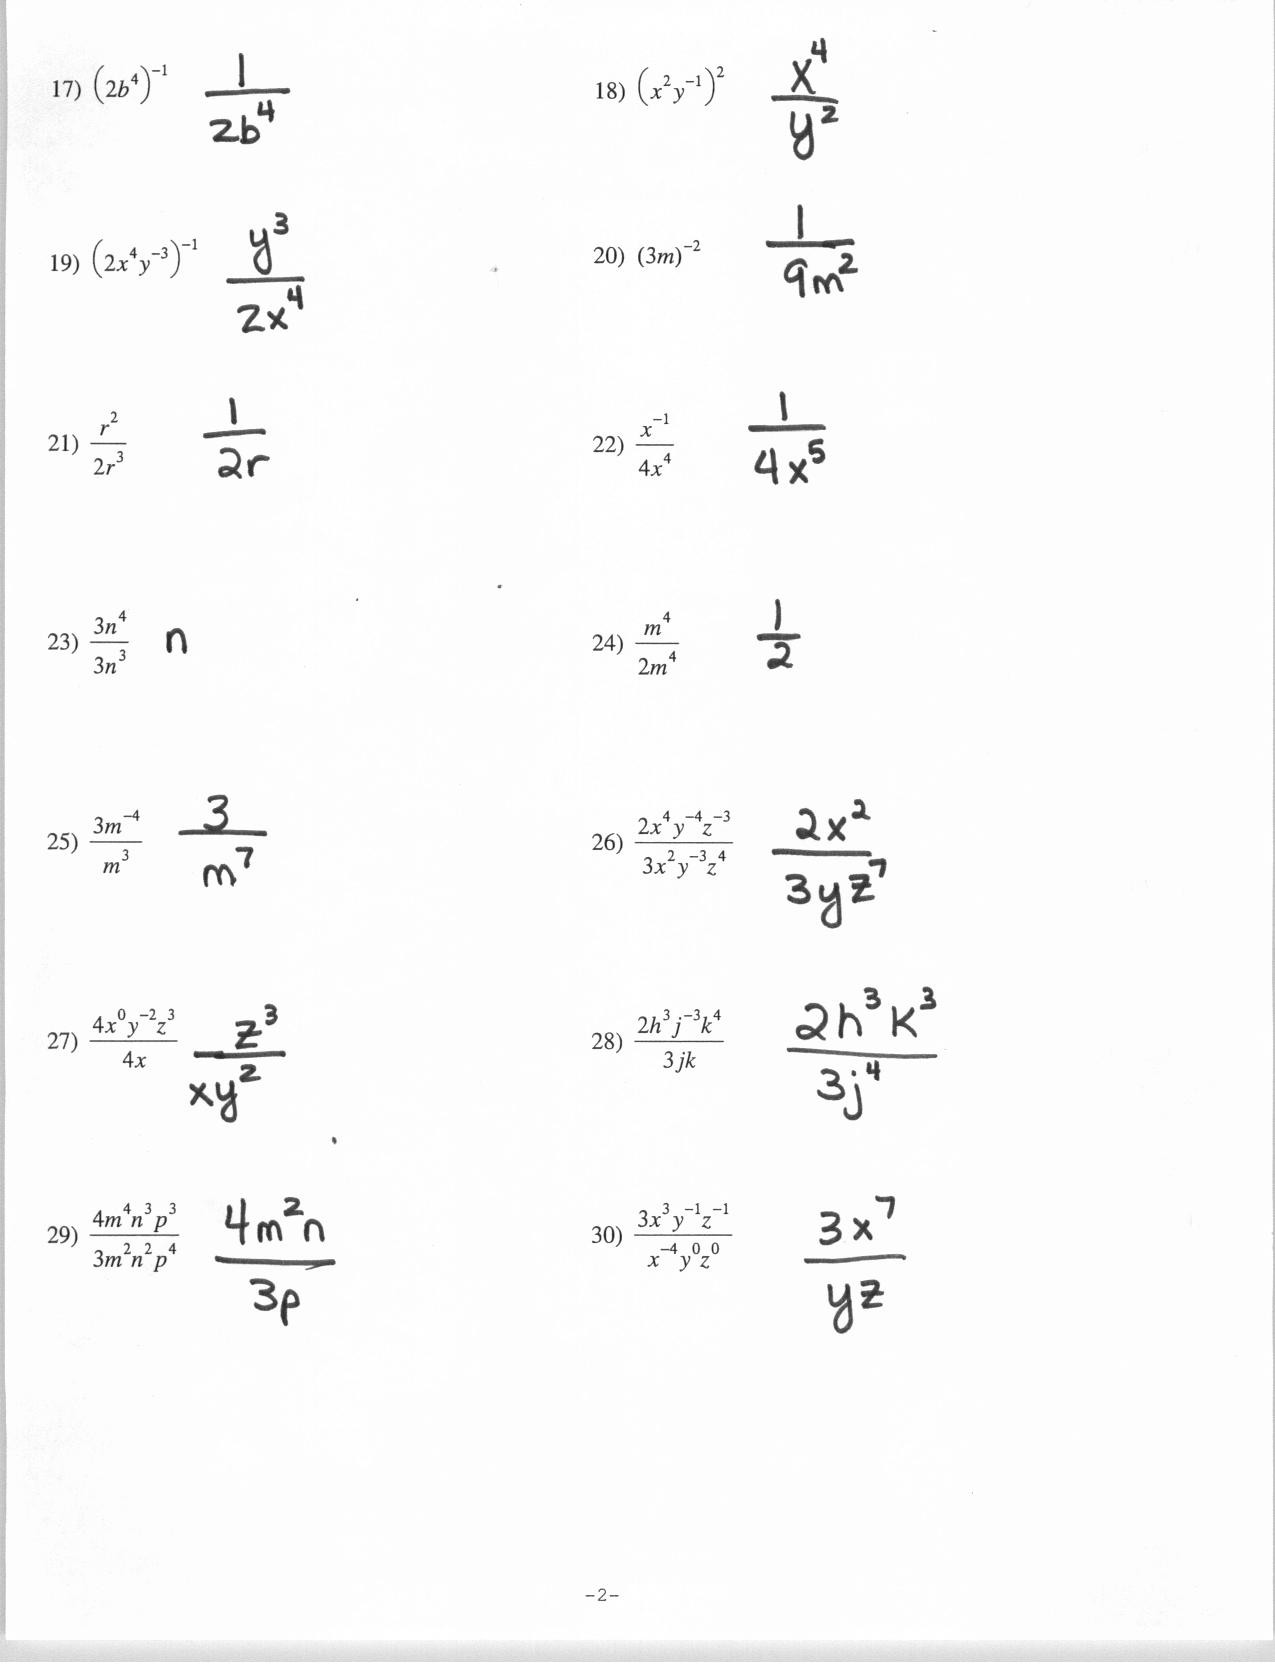 30 Negative Exponents Worksheet